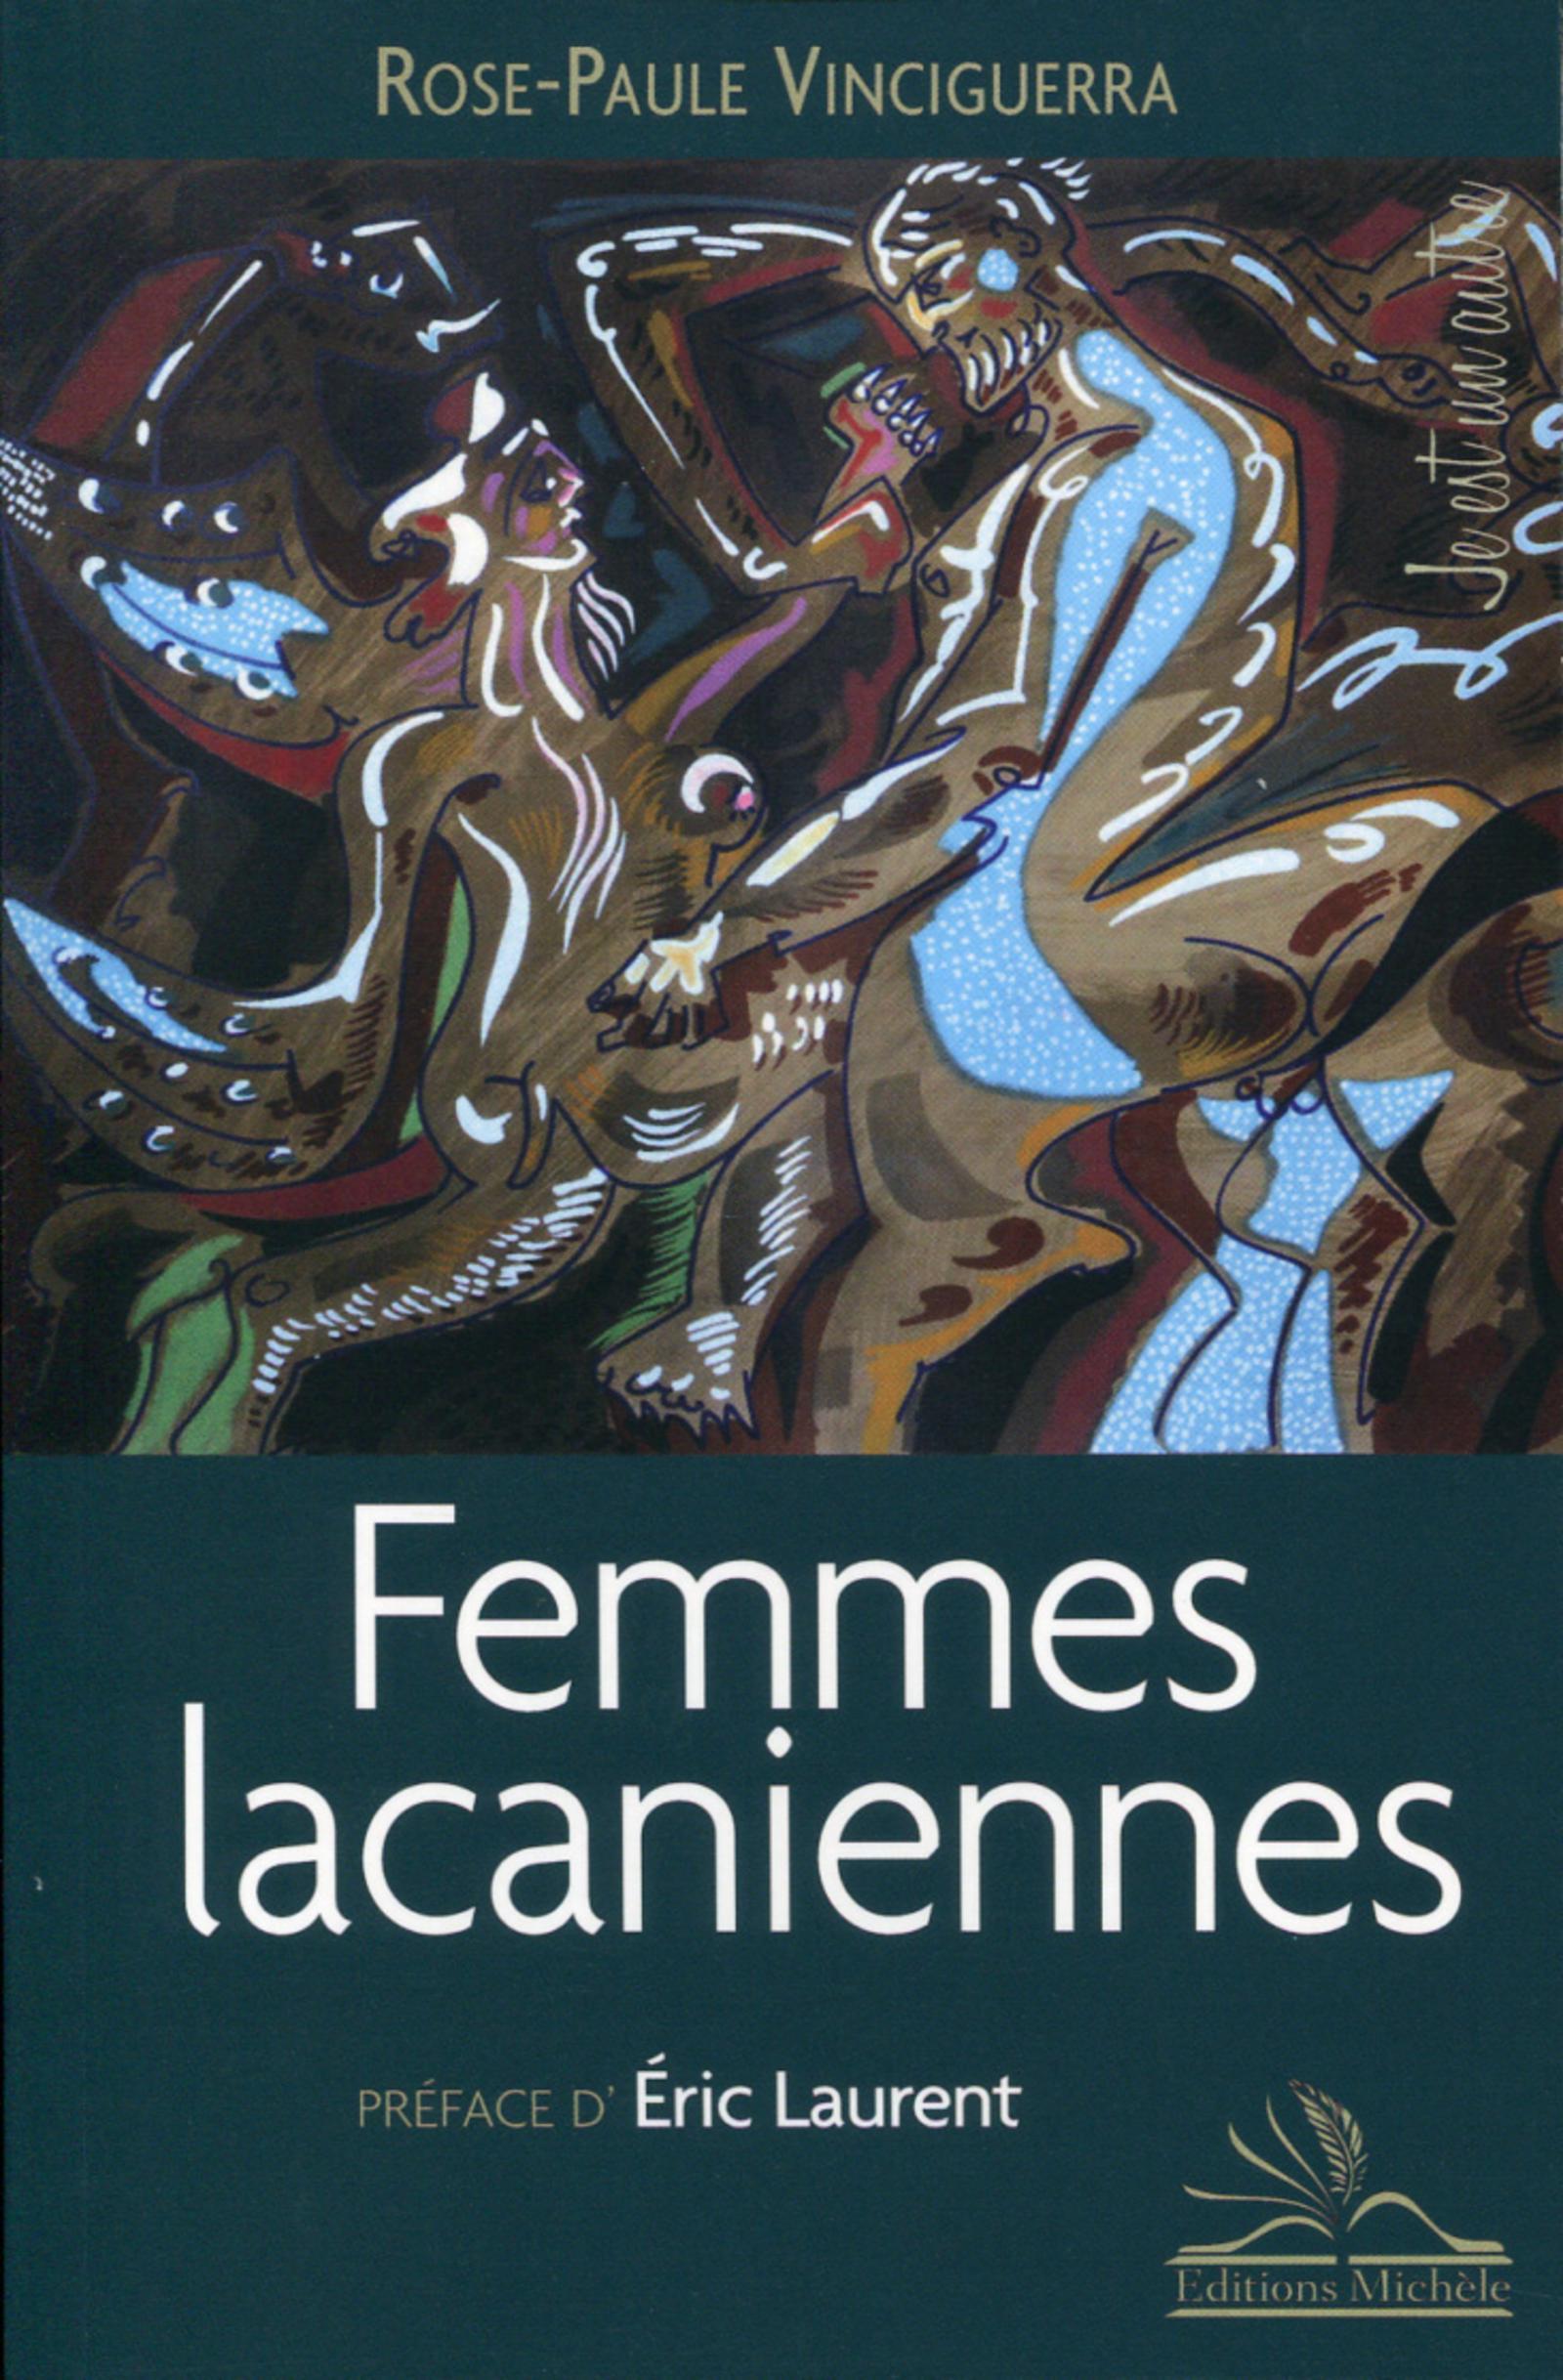 FEMMES LACANIENNES